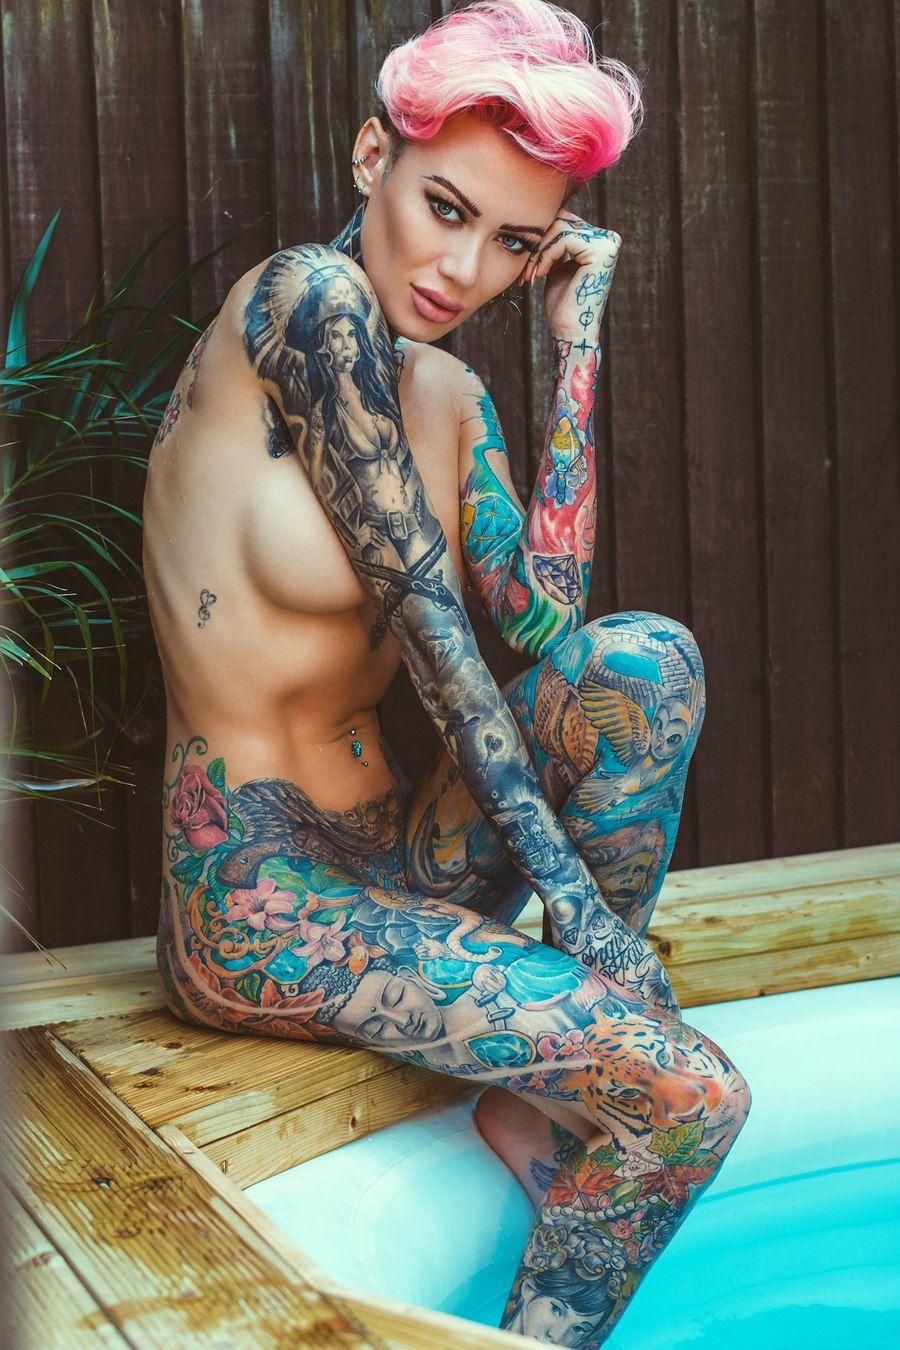 Hot tattoo frozen images 75